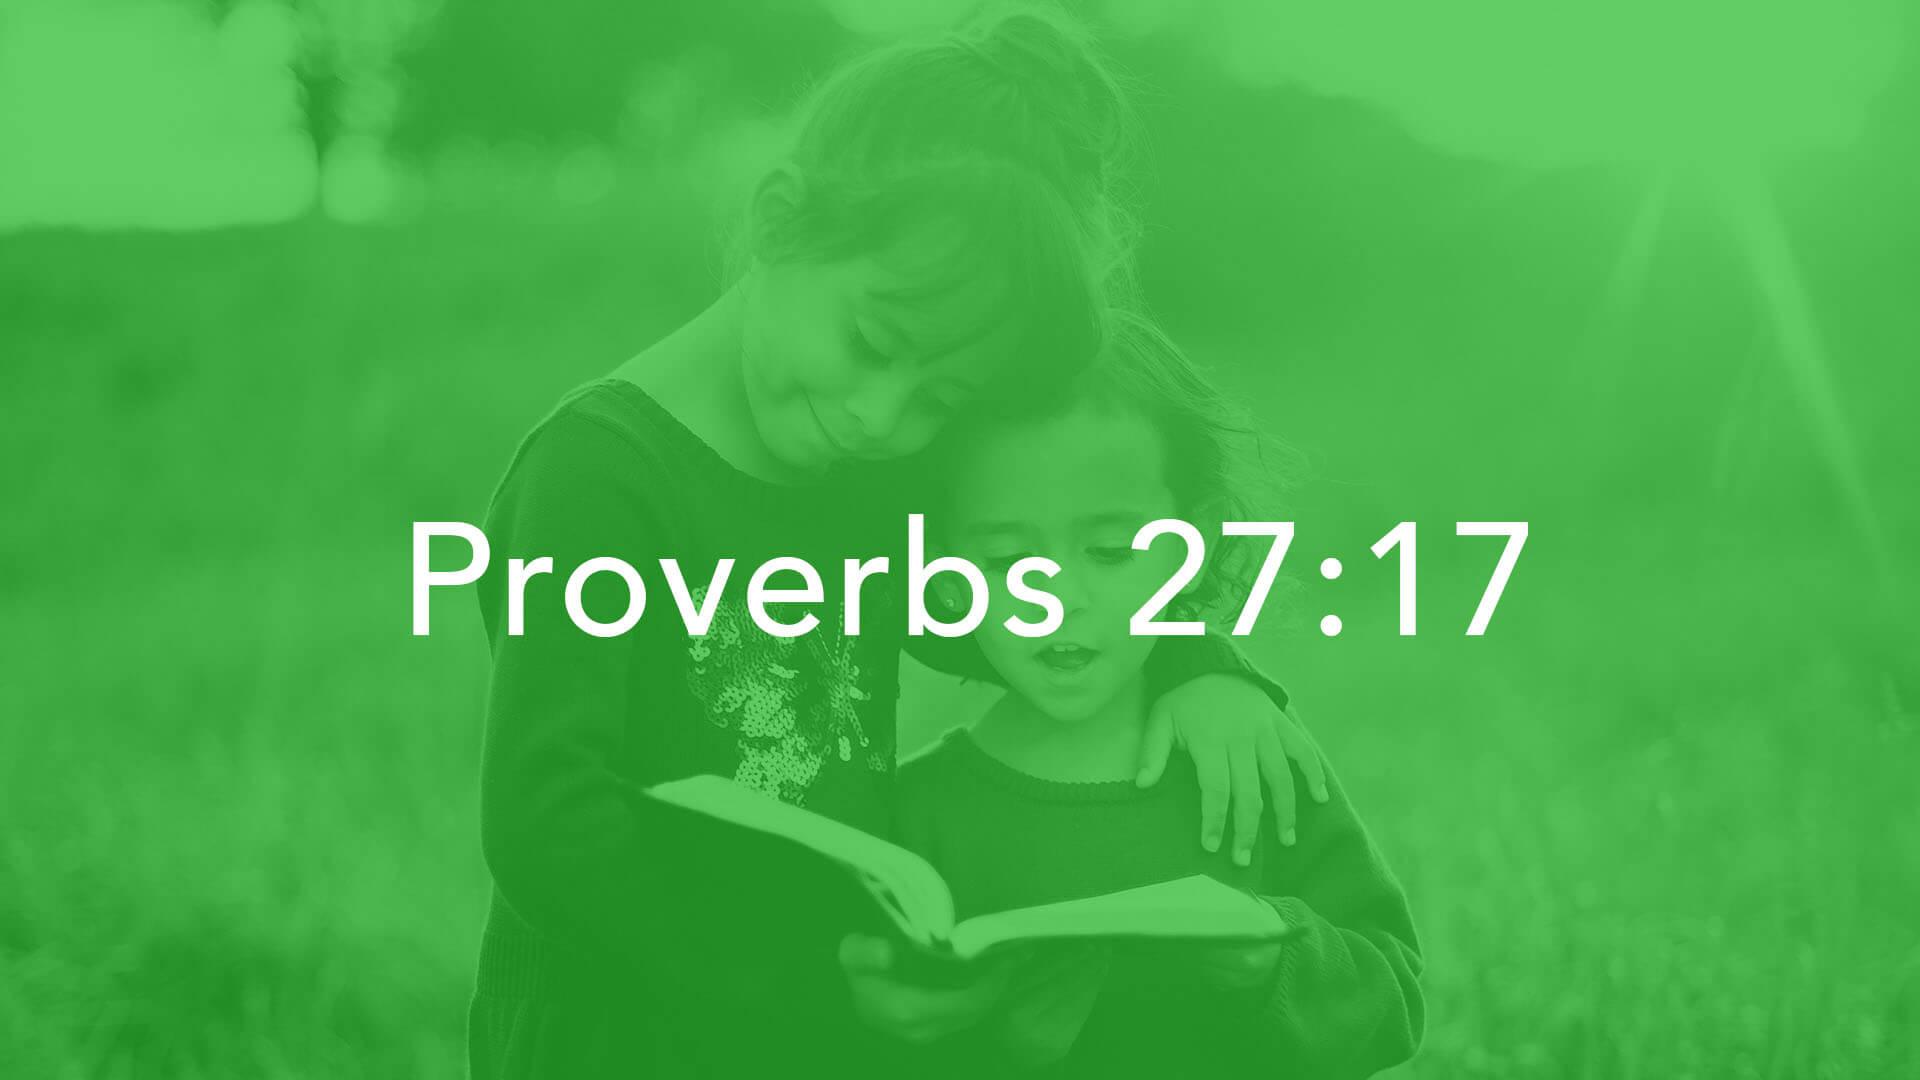 Proverbstext